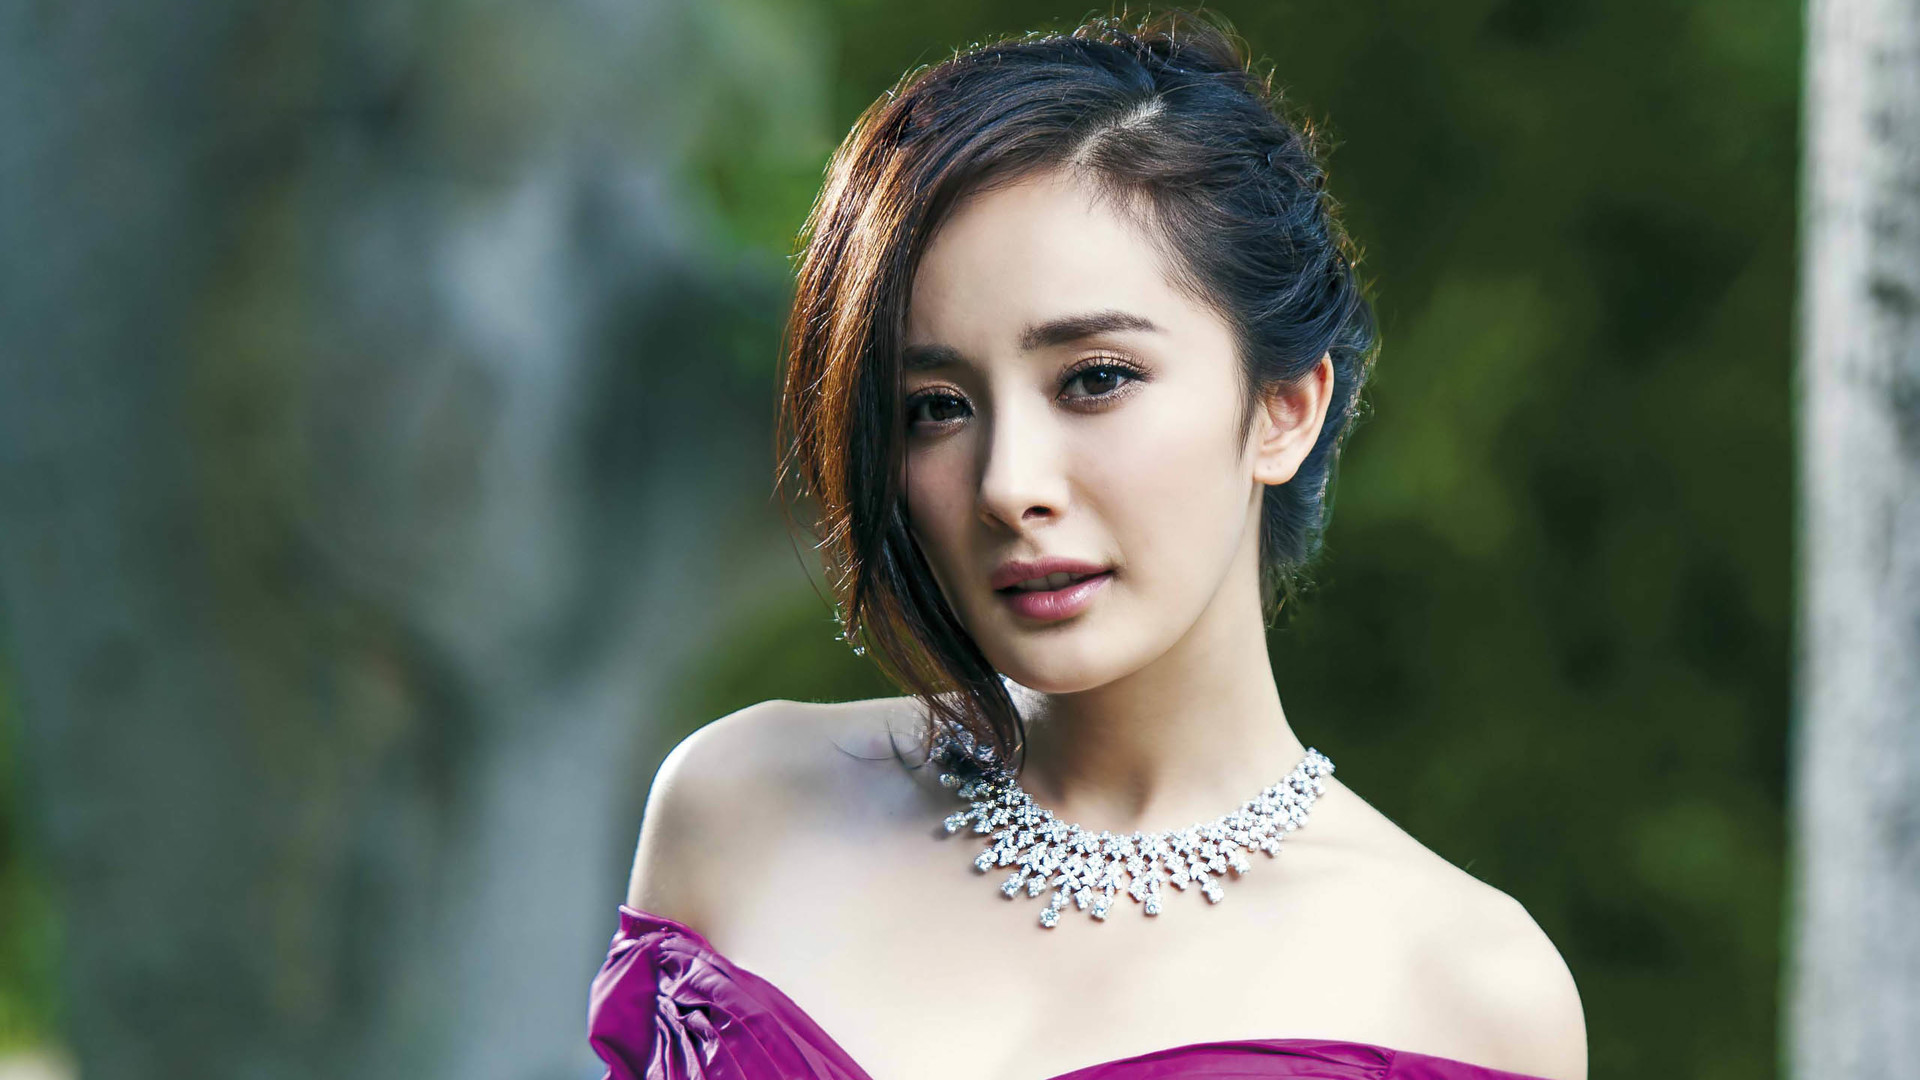 People 1920x1080 woman angel China women brunette Asian portrait shoulder length hair strapless dress yang mi